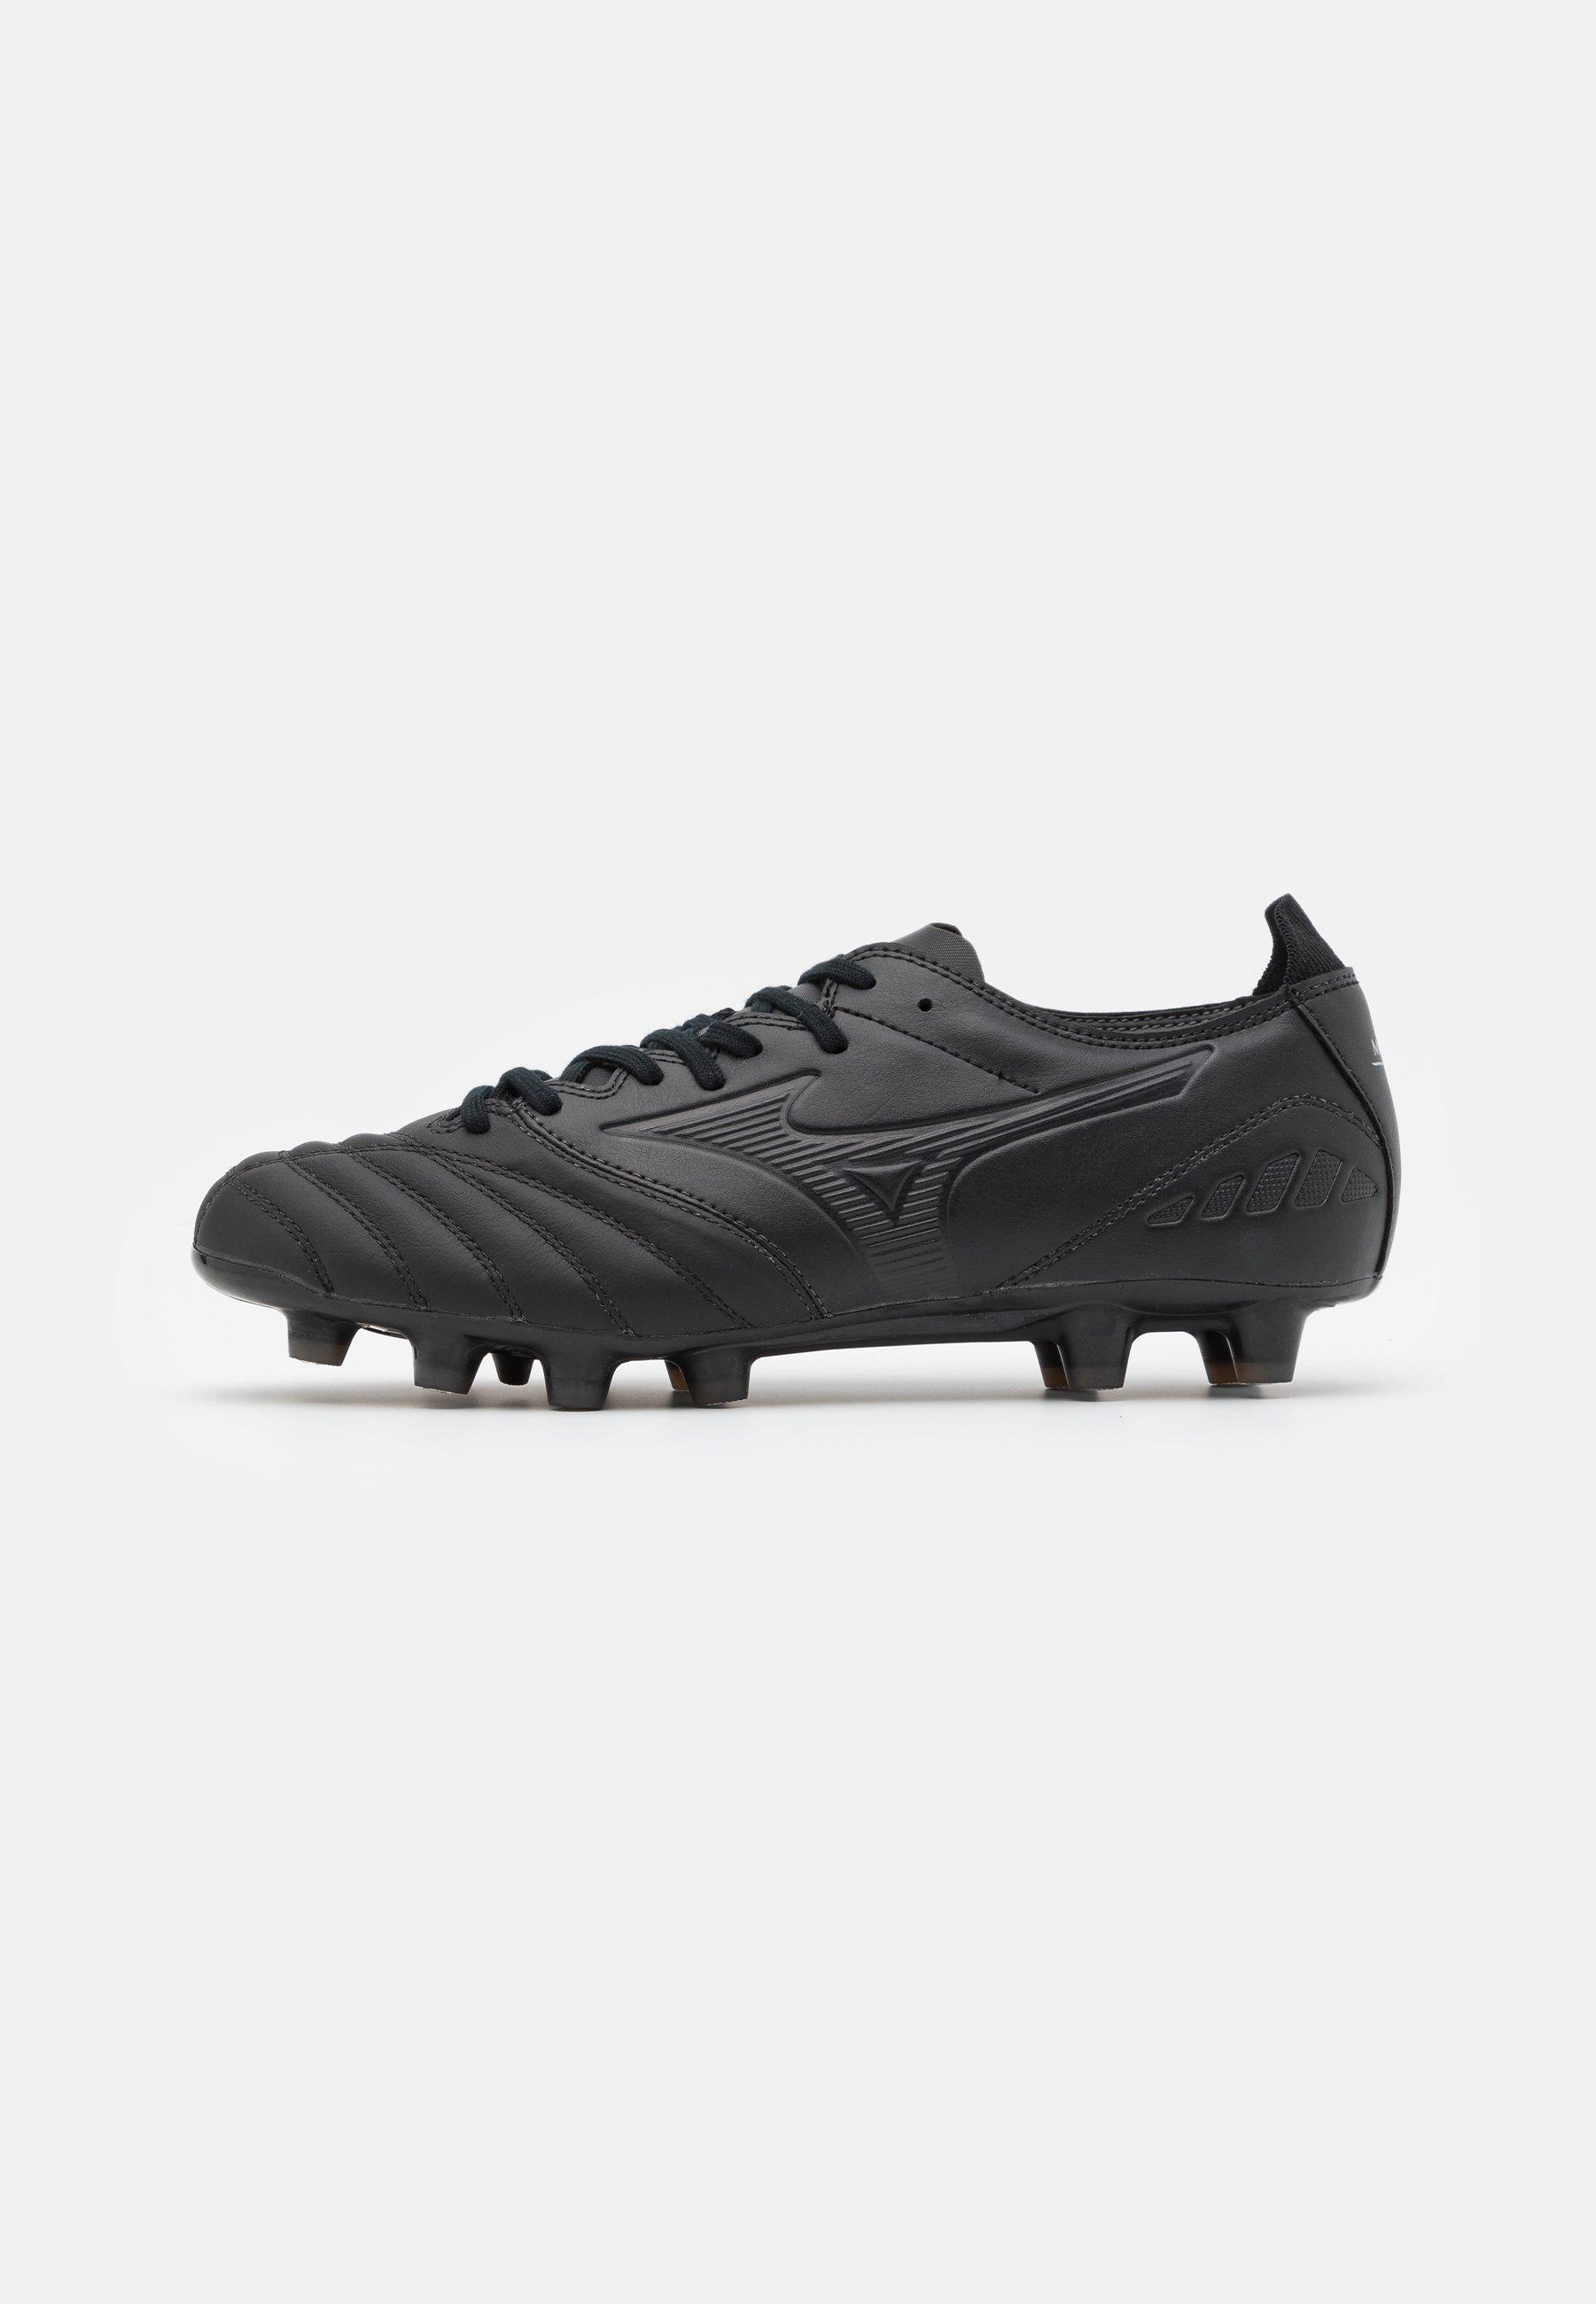 Mizuno Morelia Neo 3 Pro AG Chaussure de Football Homme